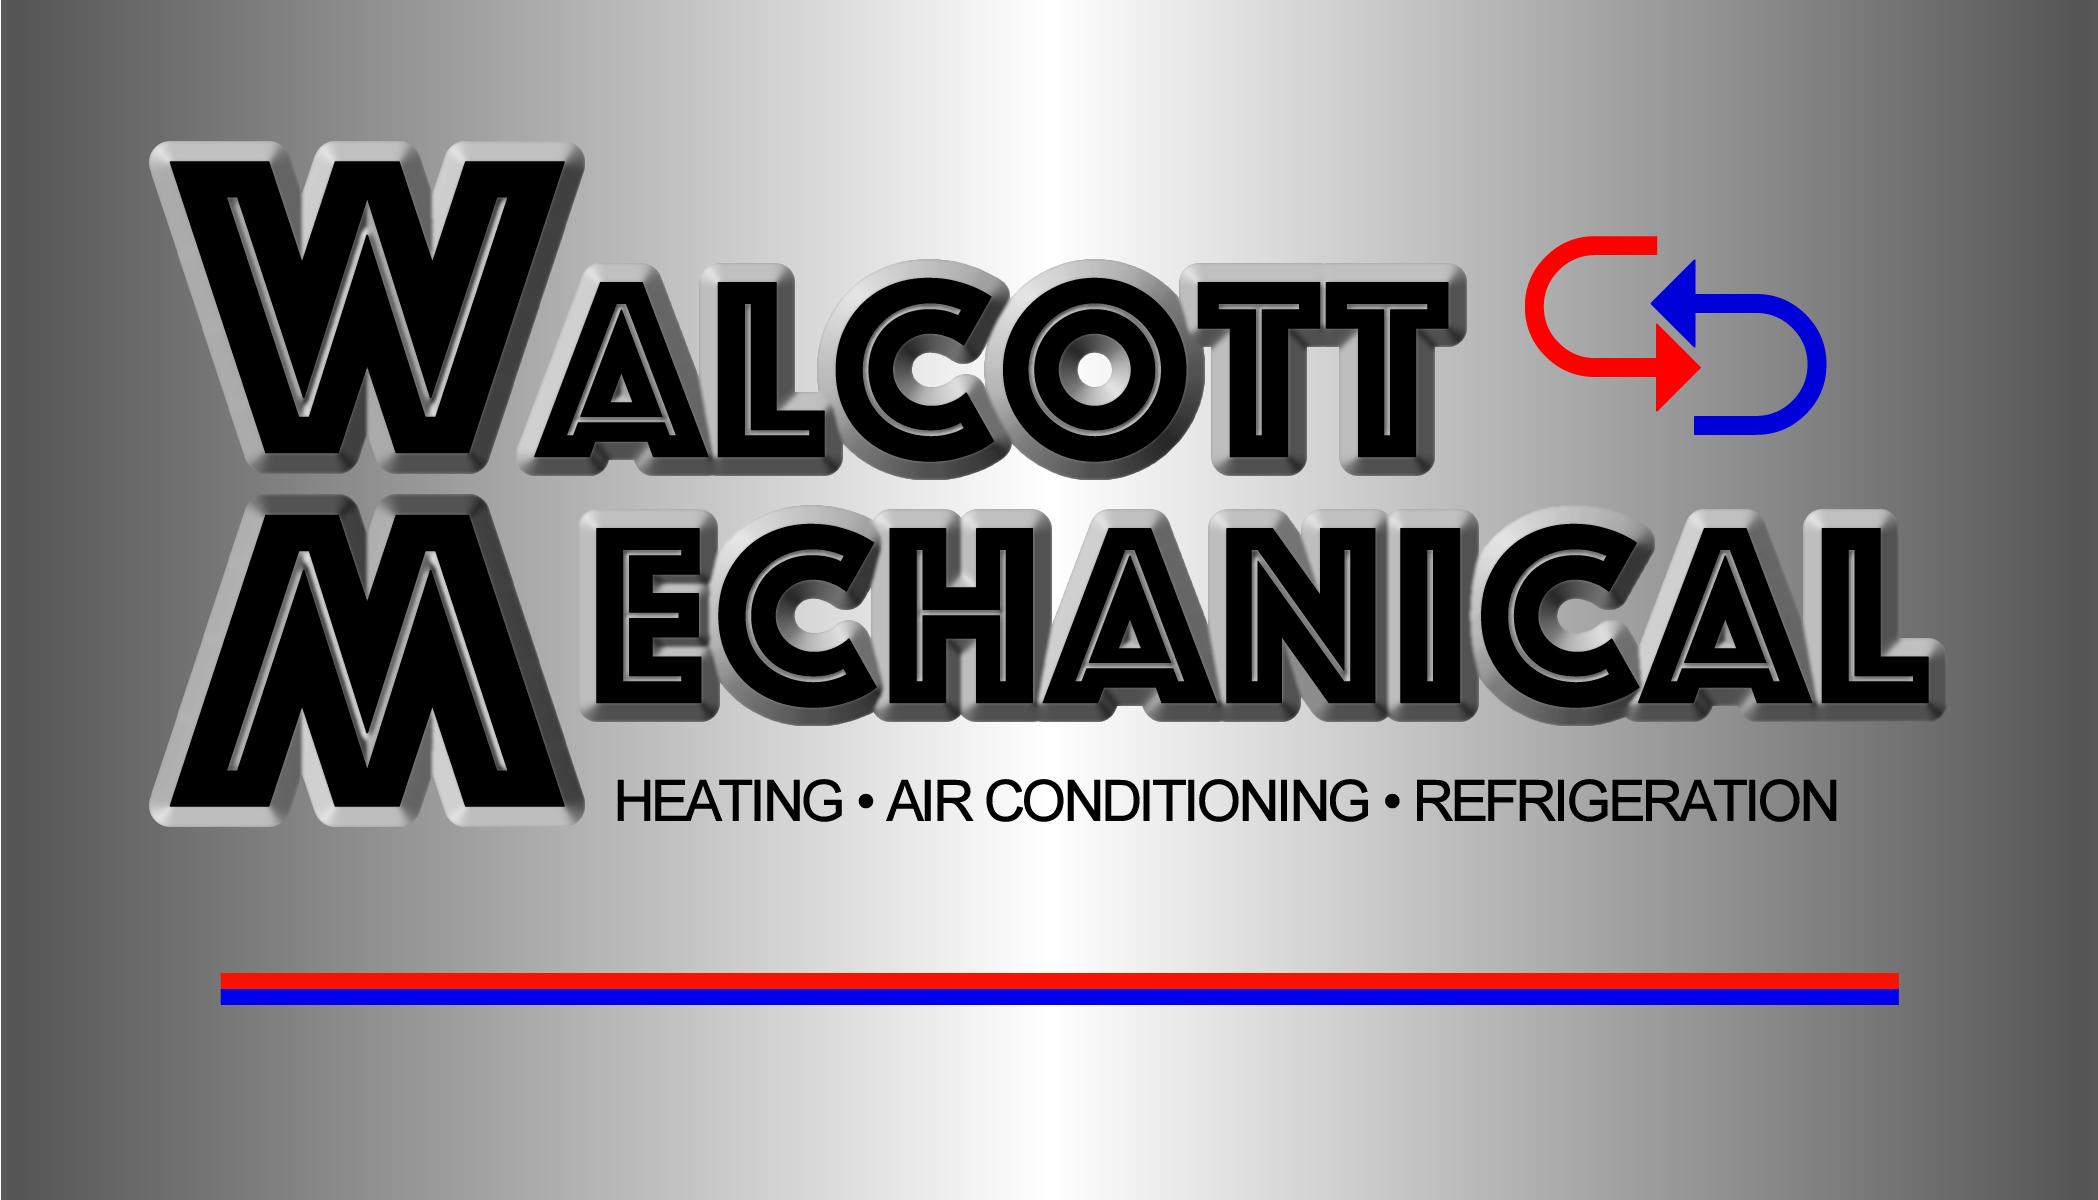 Walcott Mechanical